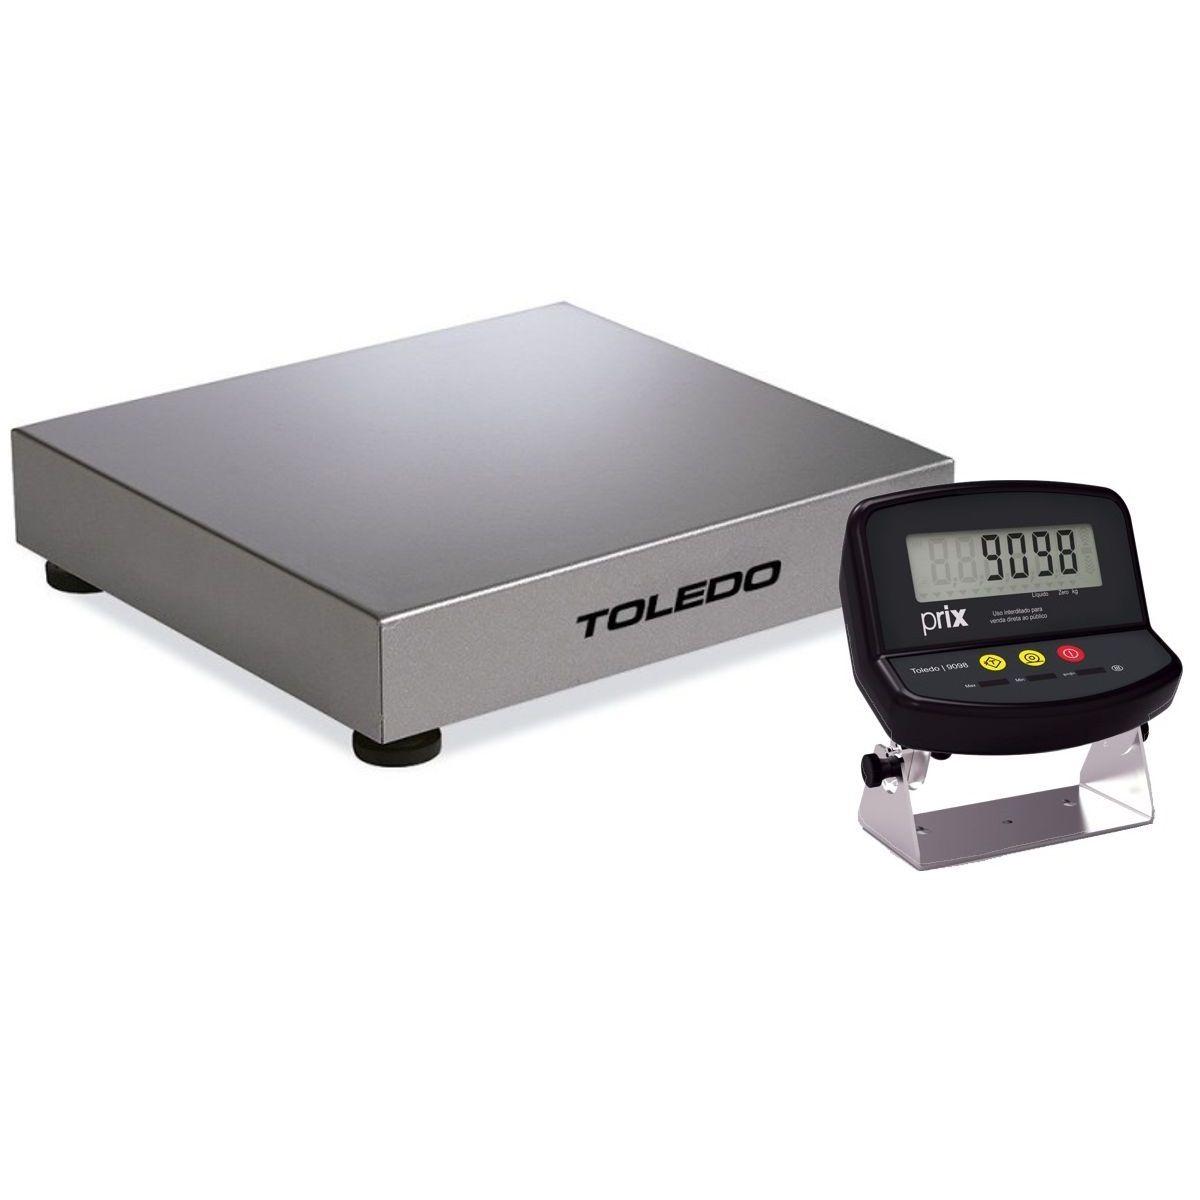 Balança de Piso Toledo 2098 (60Kgx10g) (37,5x42,5cm)